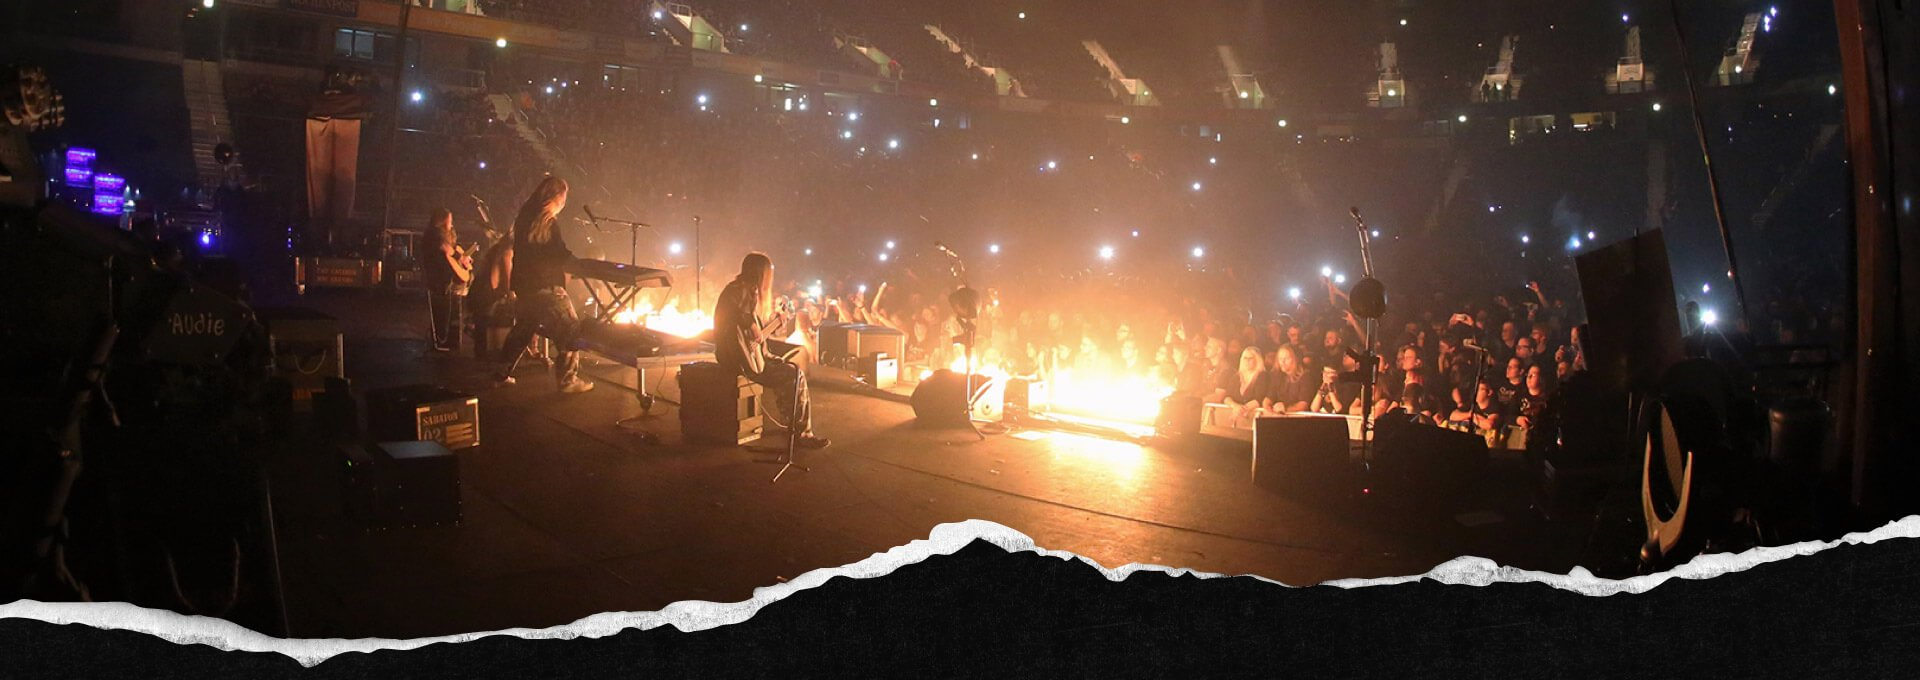 Sabaton Tour 2020 Usa Sabaton Tour   Official tour informatioon, dates, tickets and more!